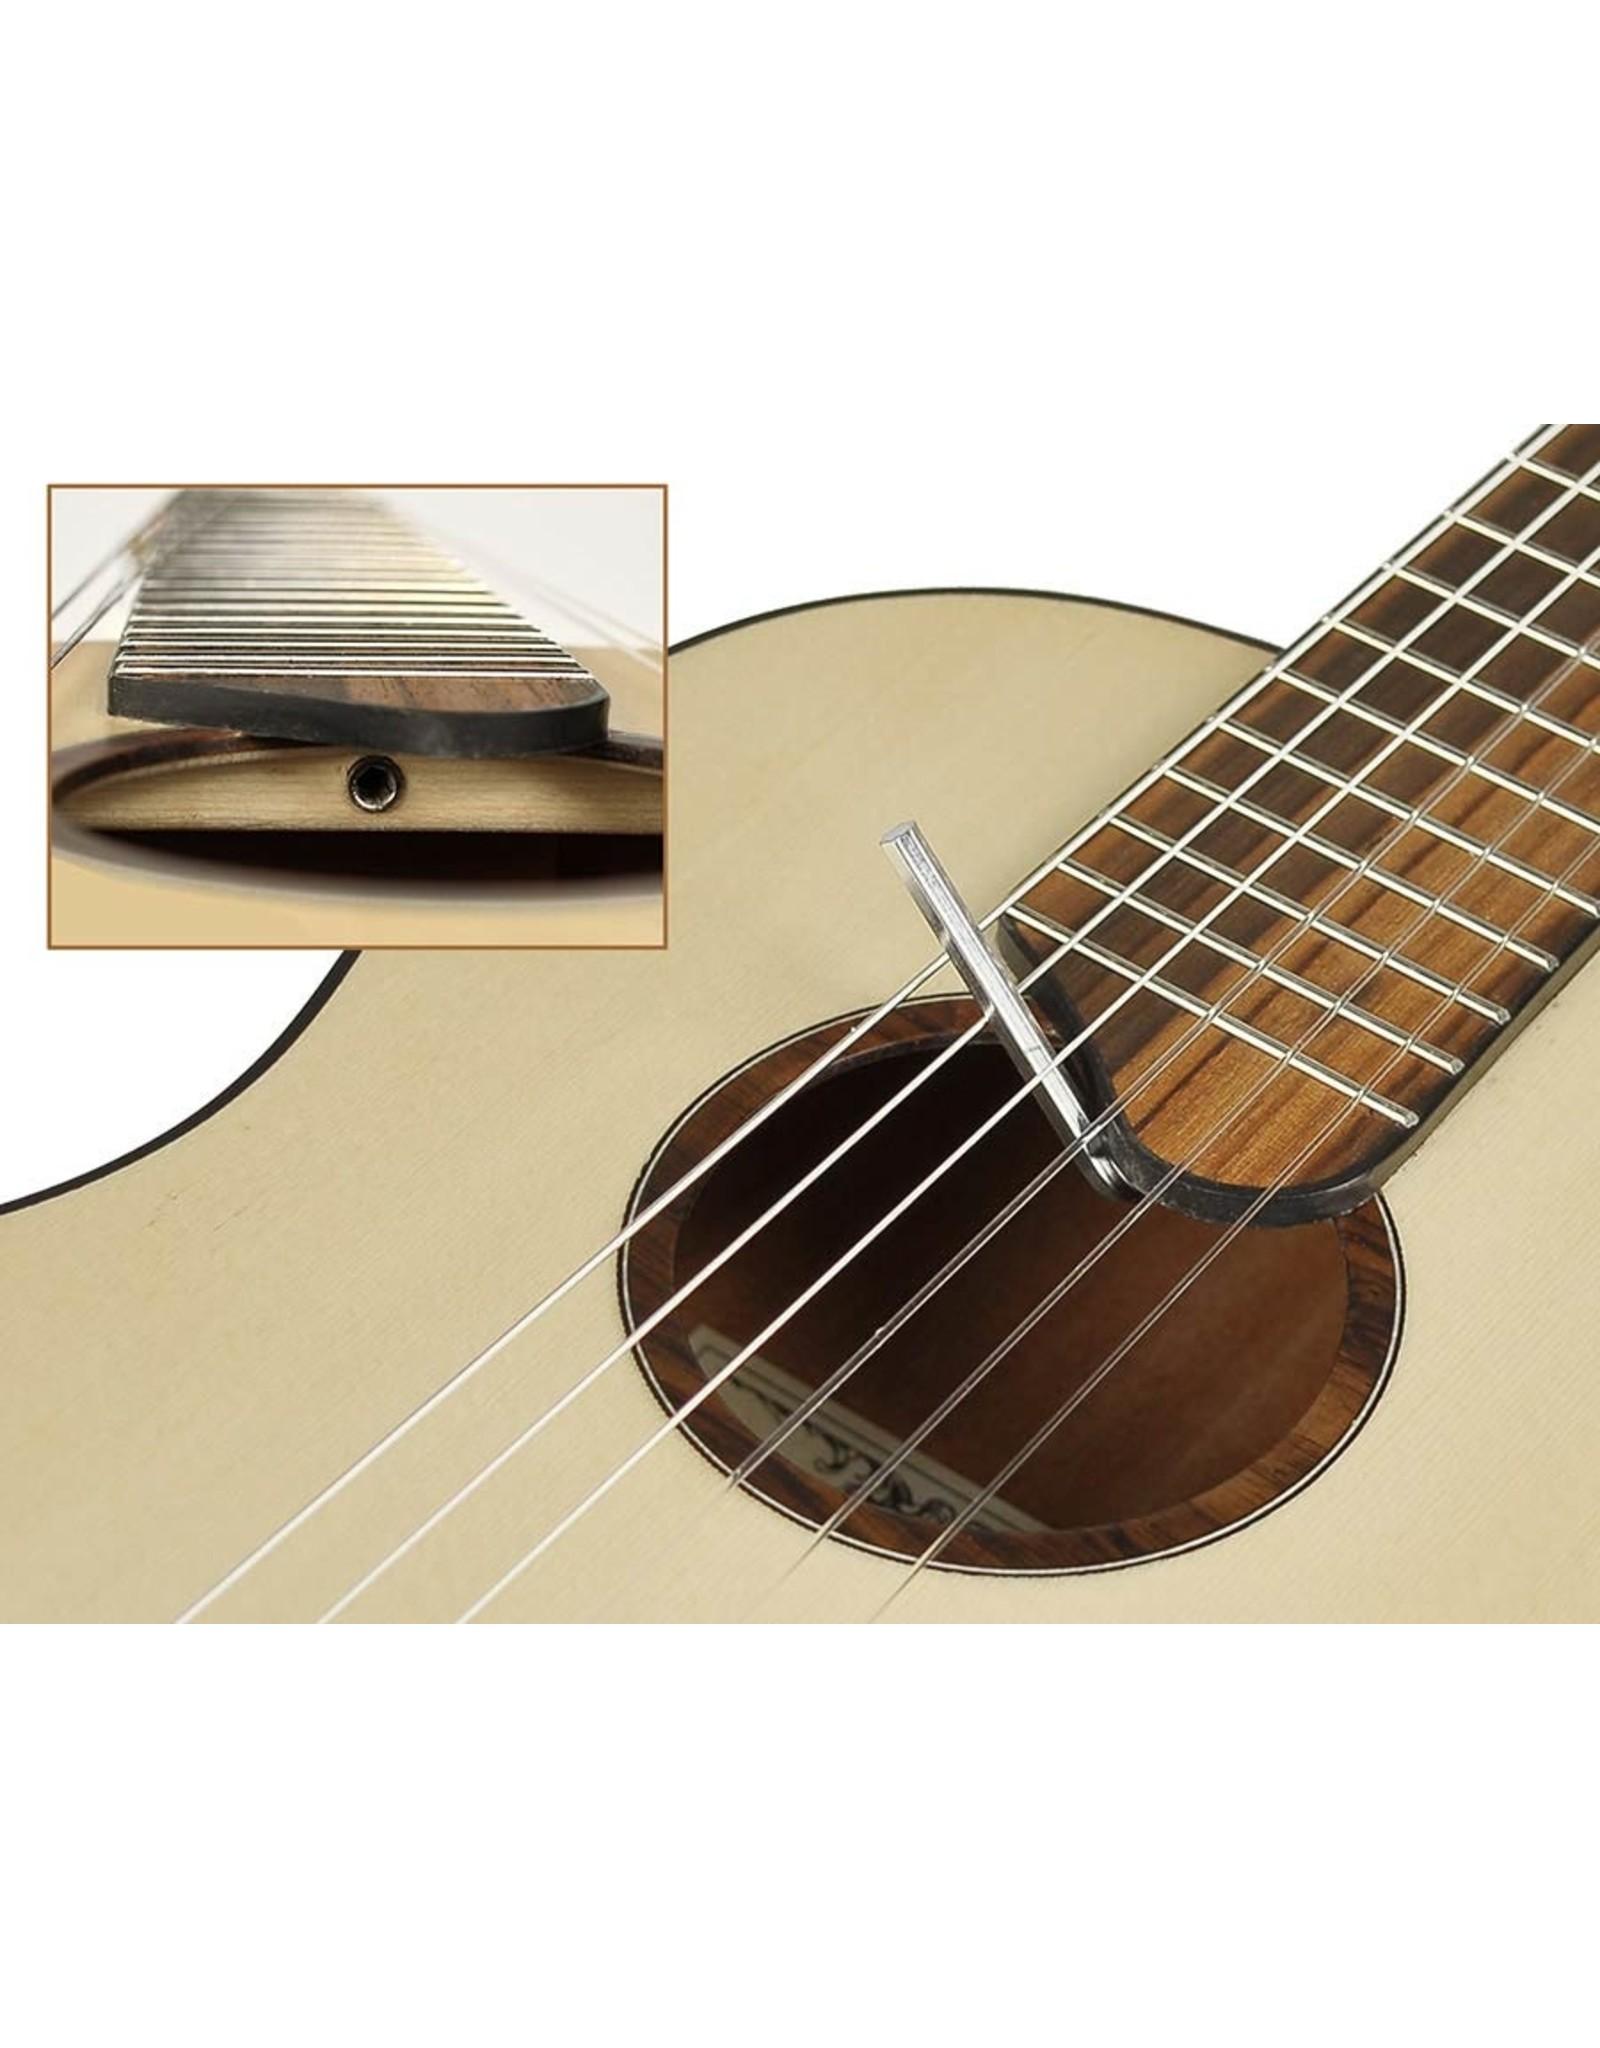 Salvador Cortez Salvador Cortez tc-460 Guitarlele